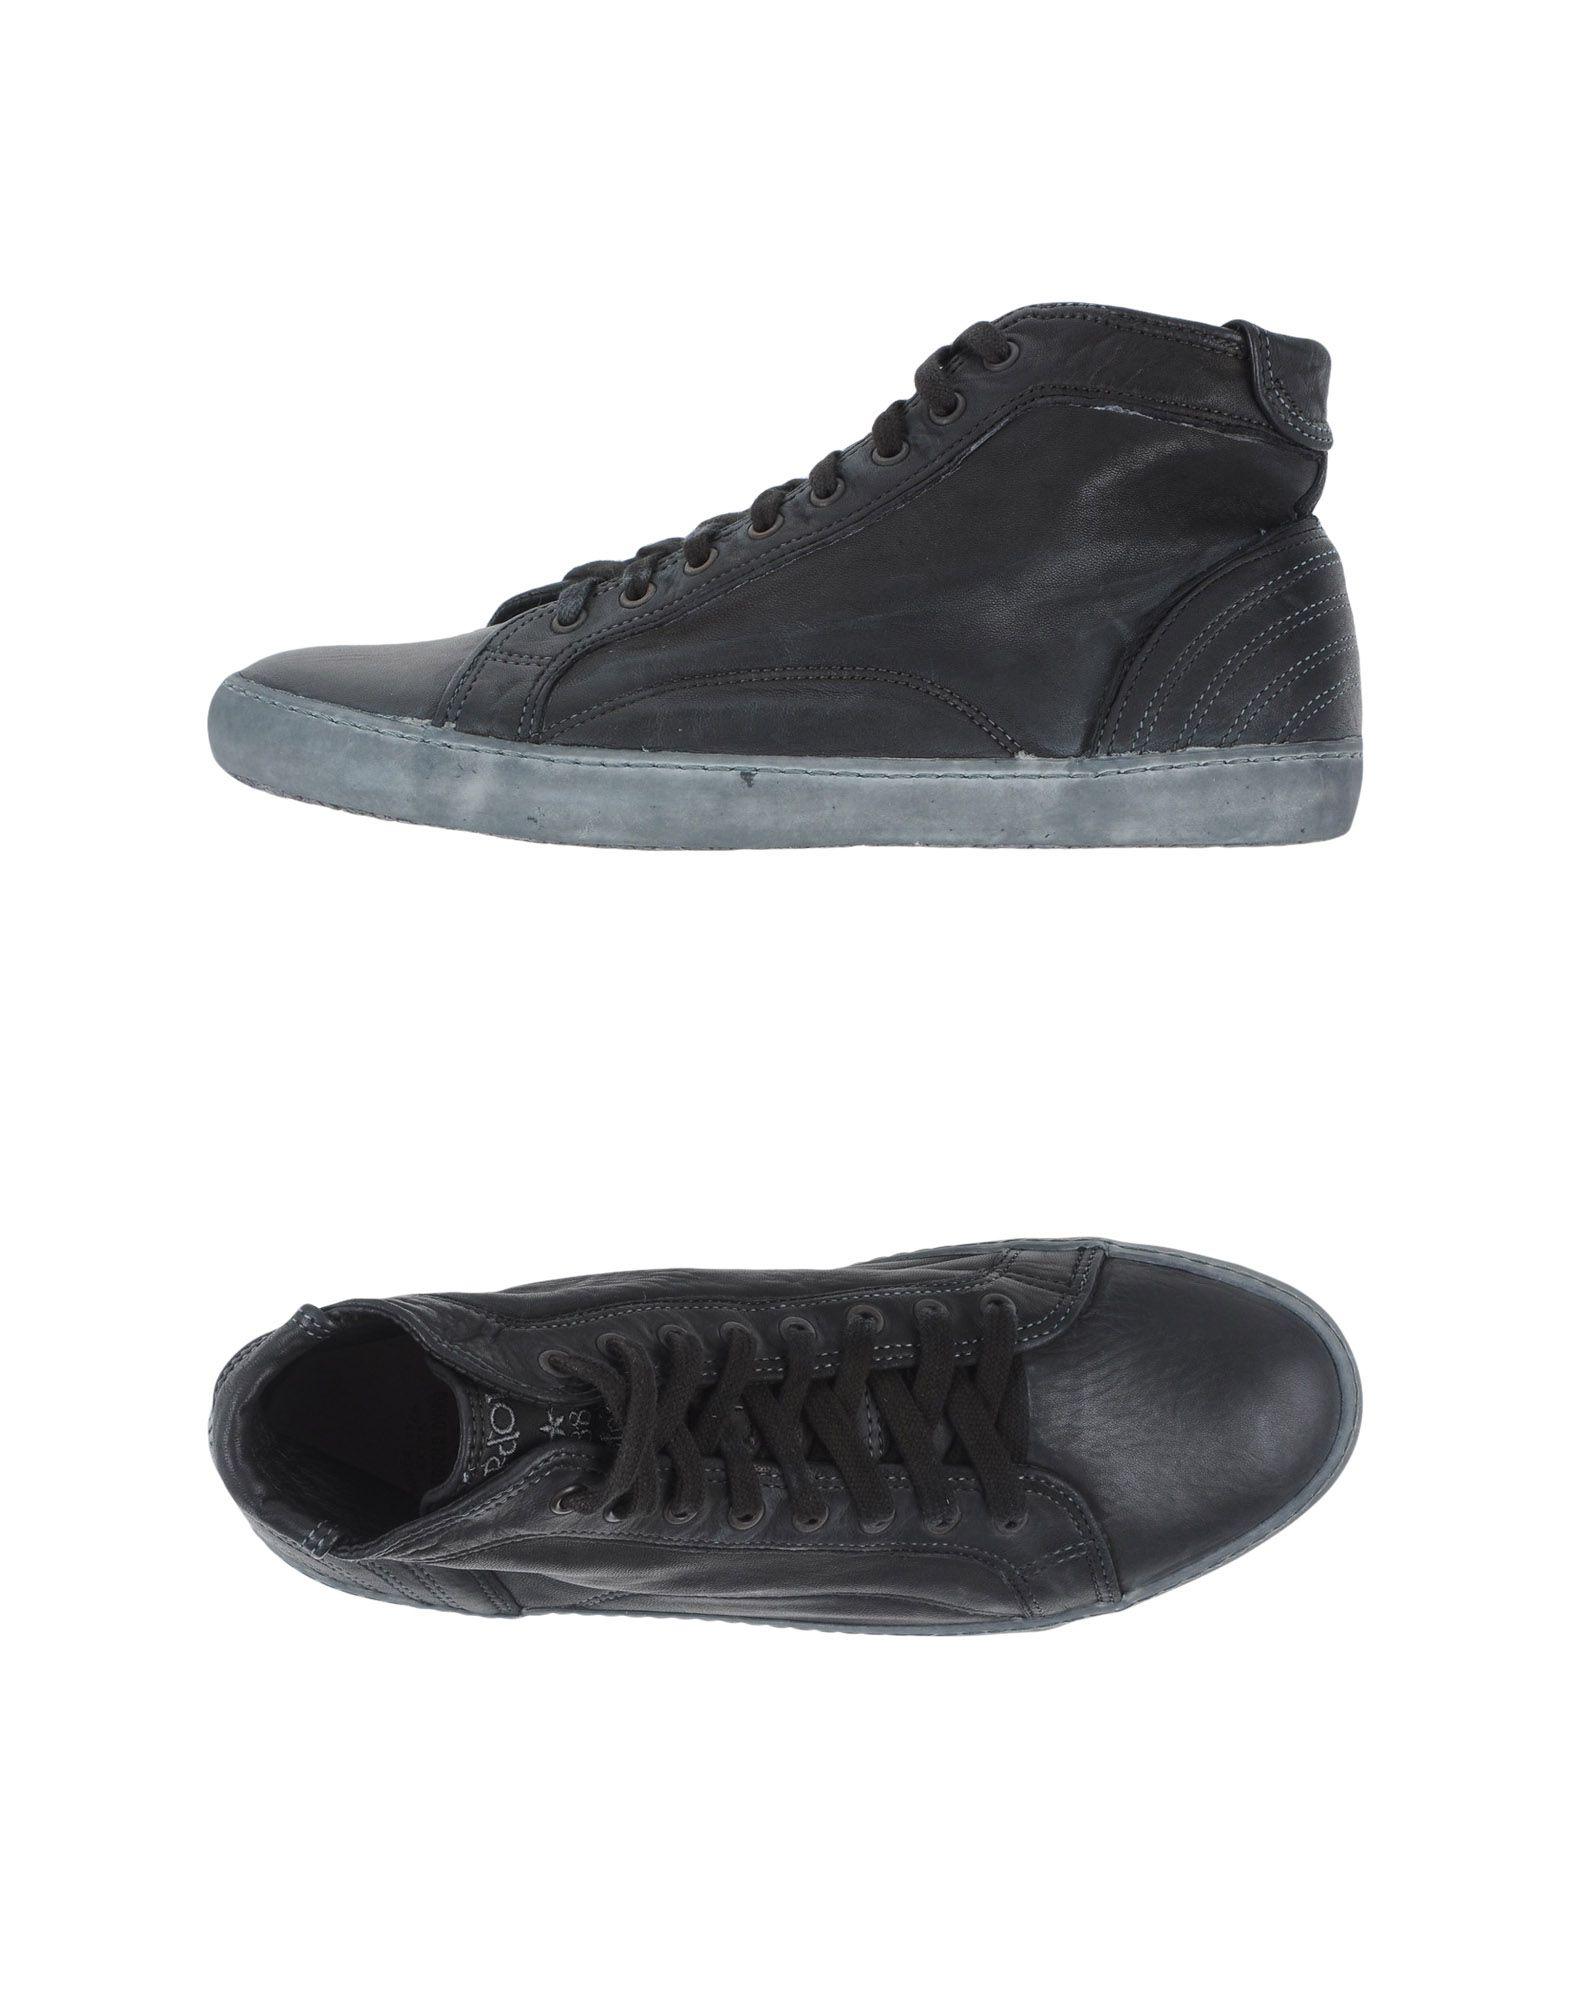 PANTOFOLA D'ORO Высокие кеды и кроссовки кеды кроссовки высокие dc council mid tx stone camo